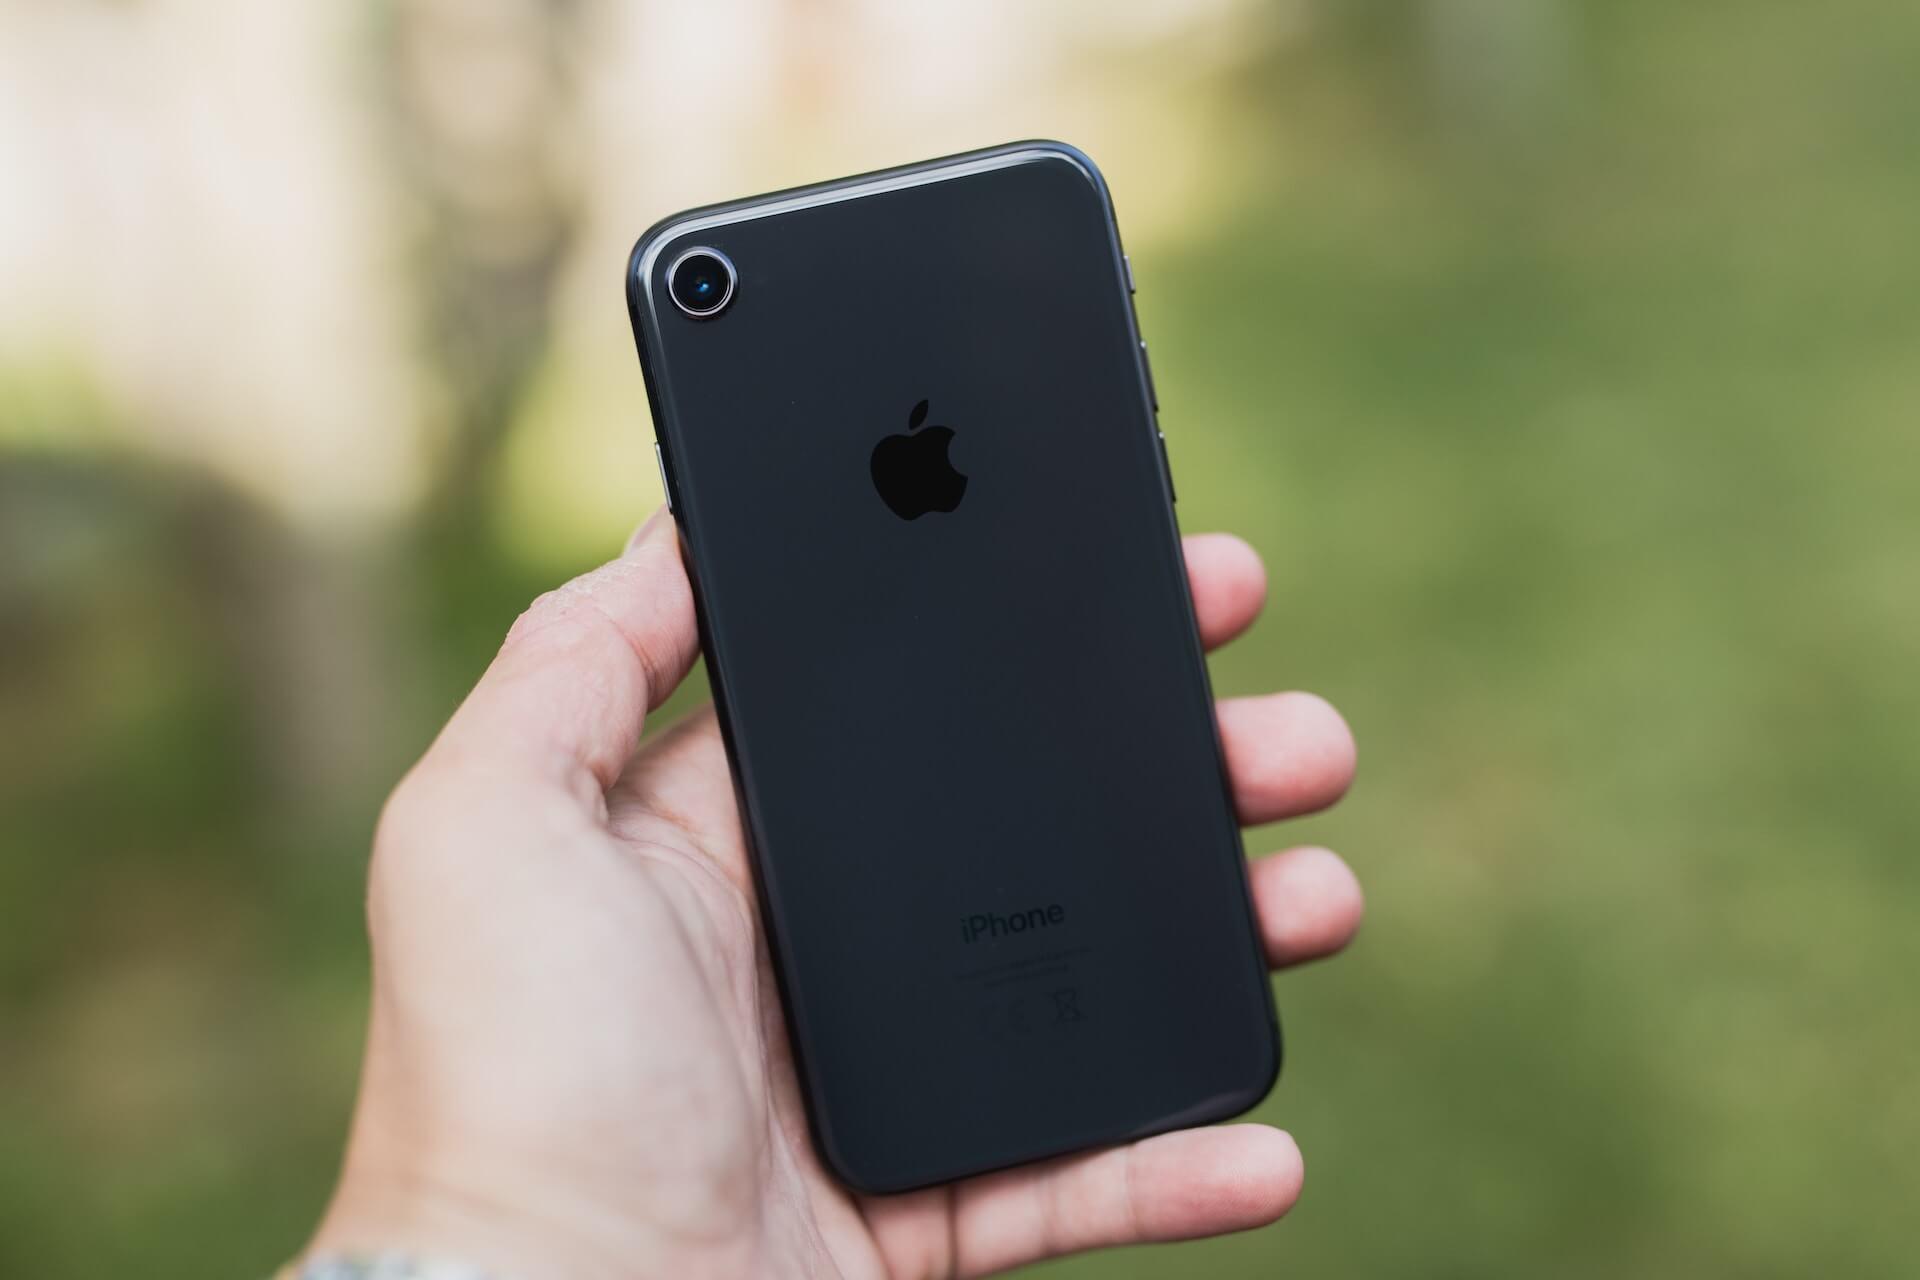 iPhone SE 2、やはり登場間近?Appleが台湾チップメーカーTSMCにAシリーズのチップの大量増産を要請か tech200122_iphone_chip_main